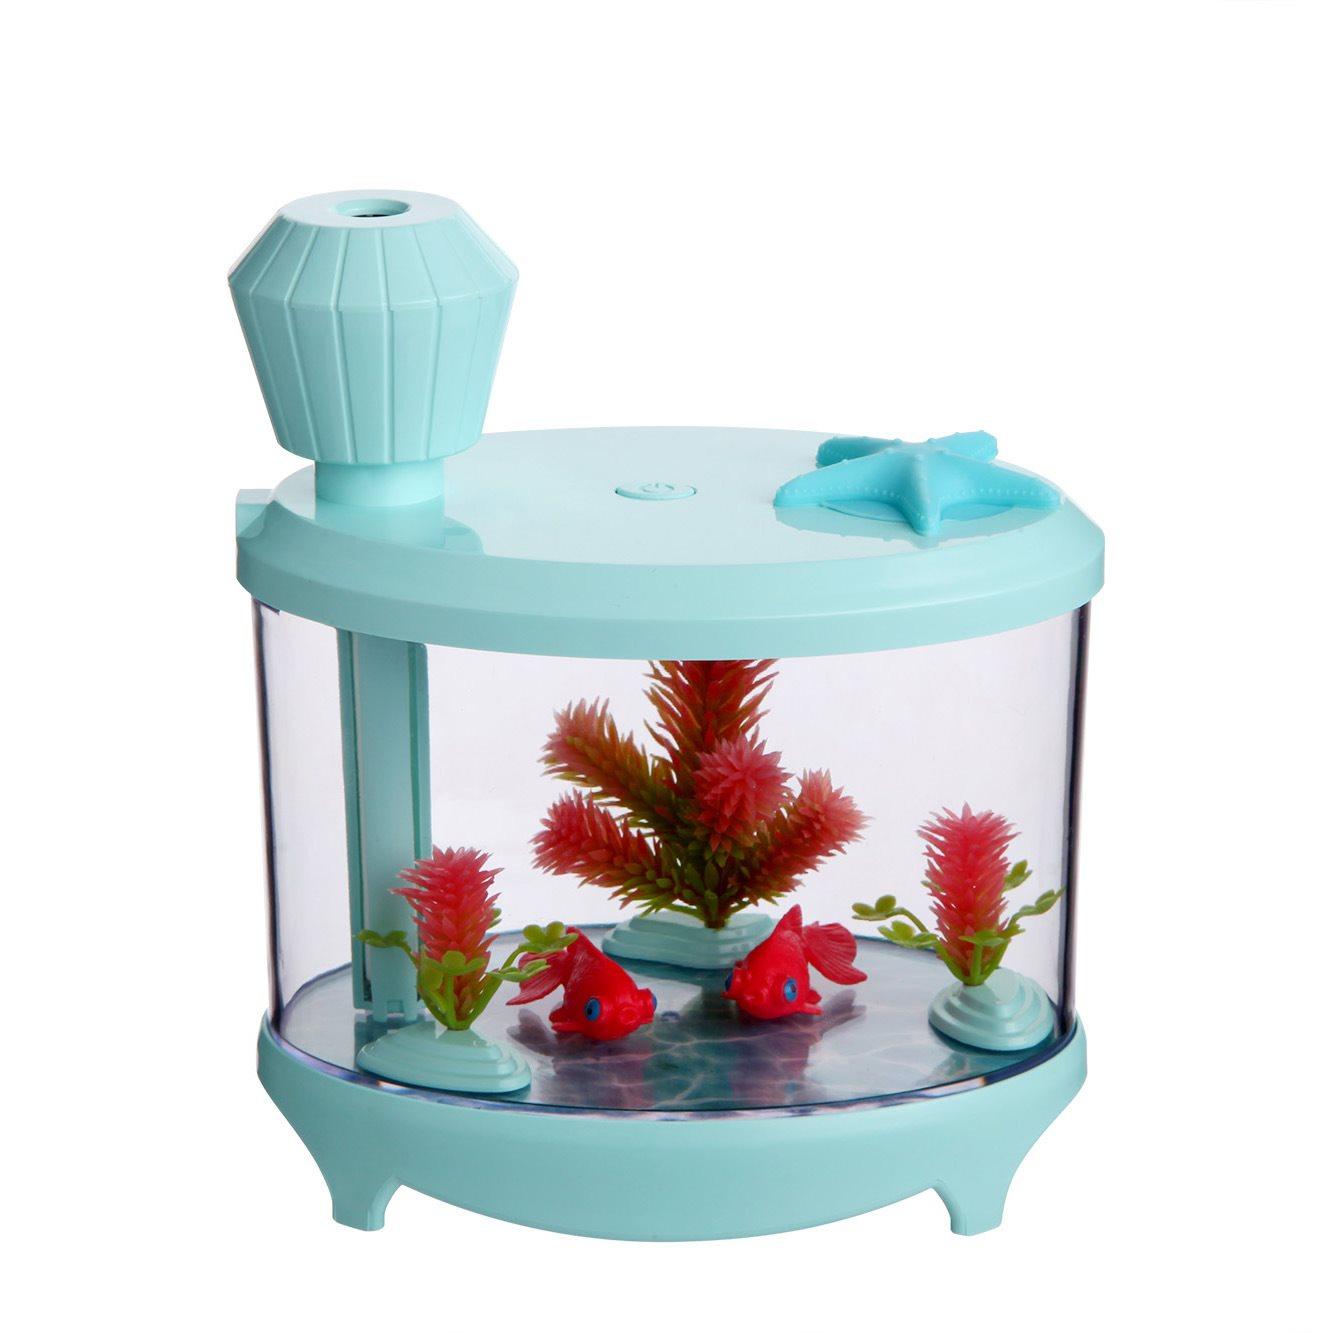 [u[2200634662683]加湿器]新款鱼缸加湿器 迷你b小夜灯加湿器超月销量0件仅售122元